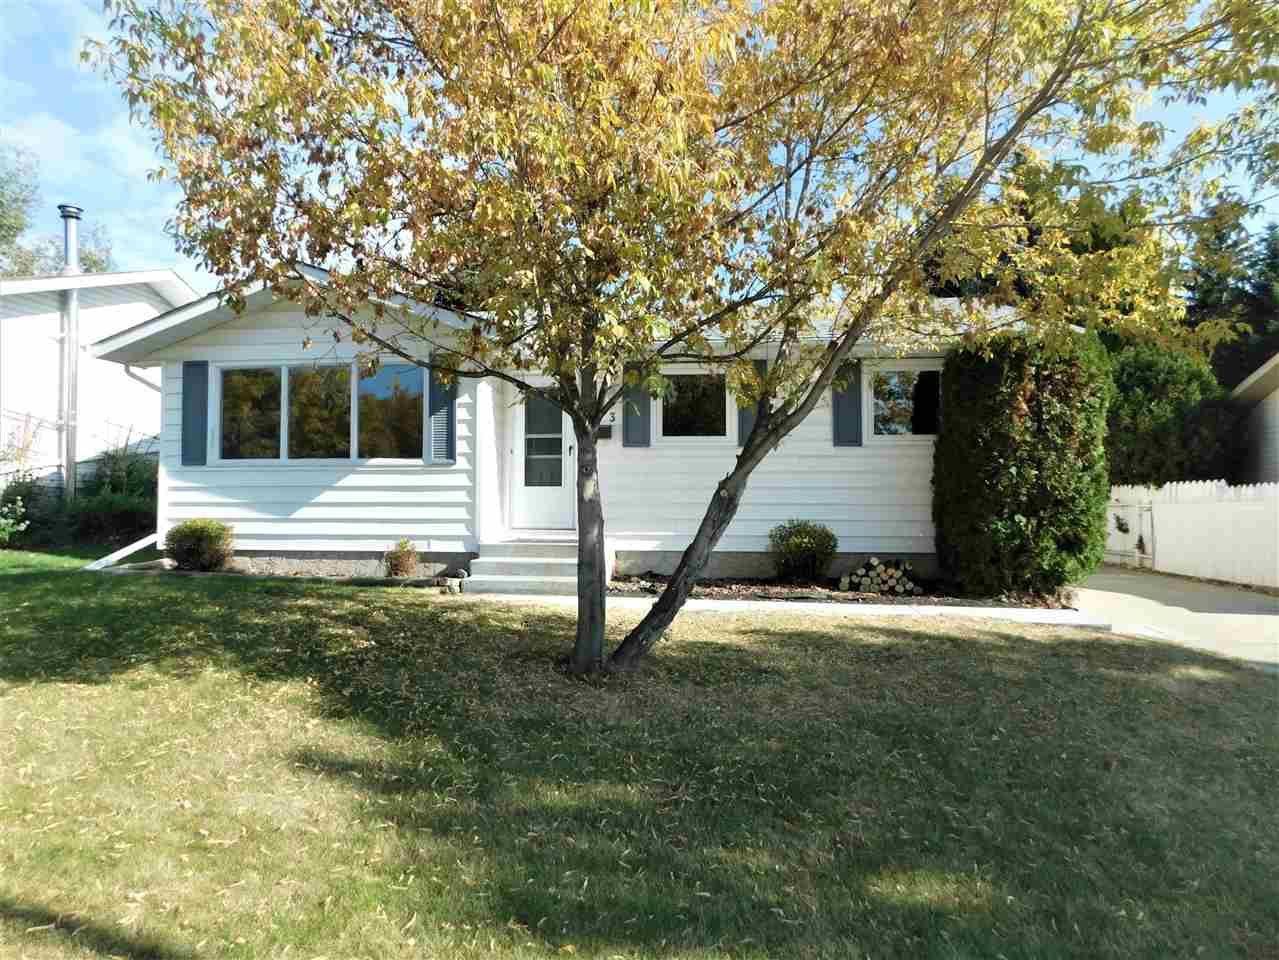 Main Photo: 133 Greengrove Avenue: Sherwood Park House for sale : MLS®# E4216840